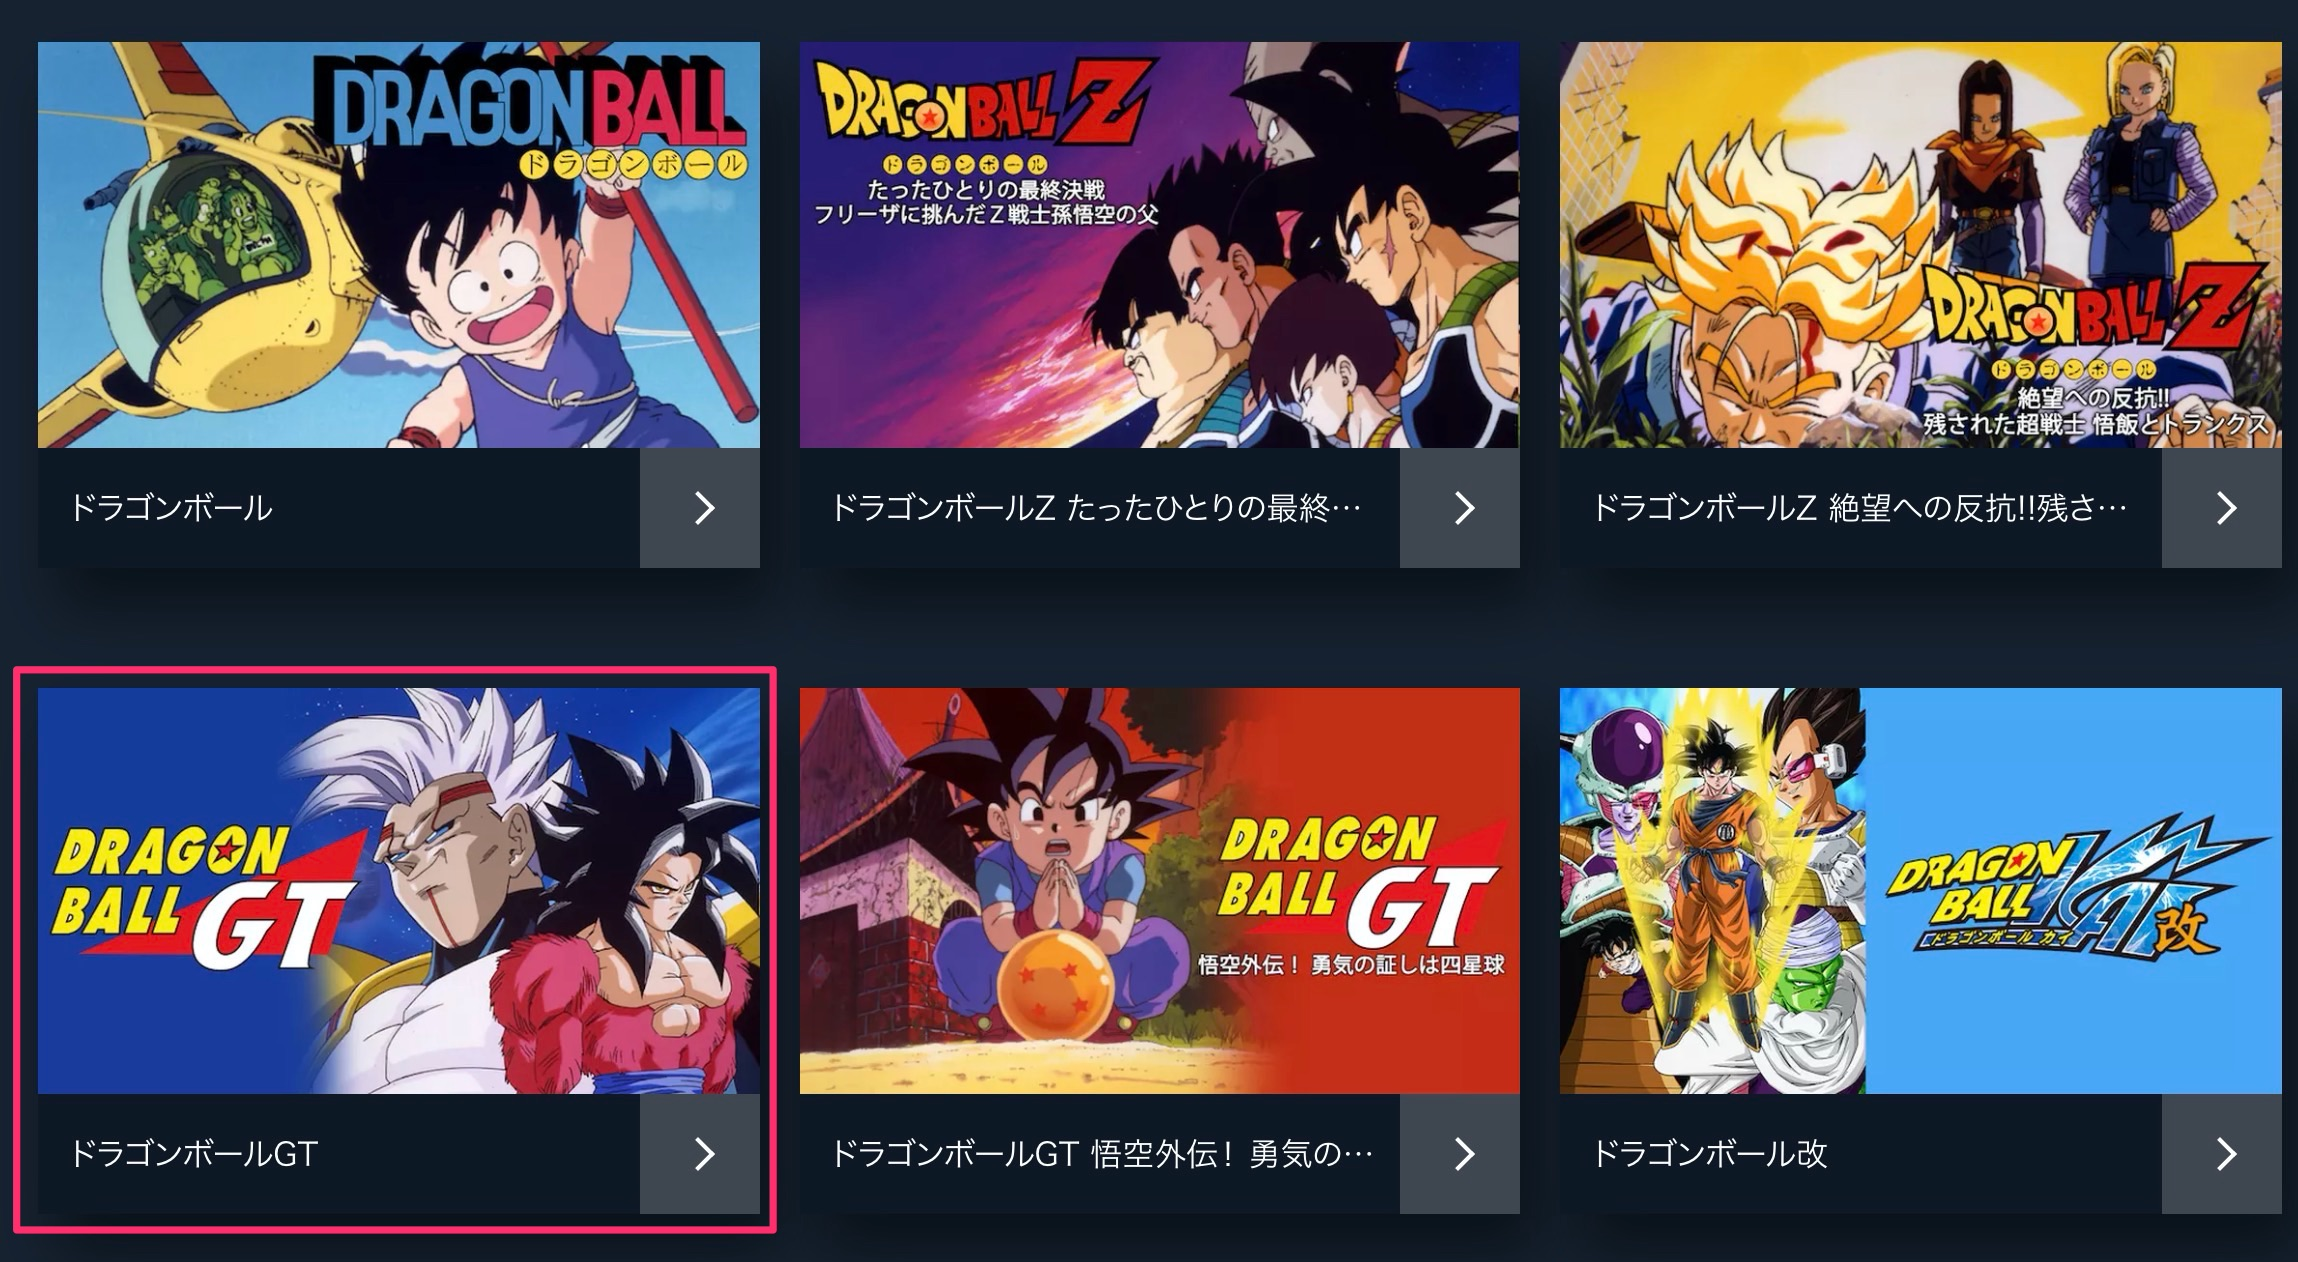 U-NEXTでアニメ『ドラゴンボールGT』は動画配信をしている?